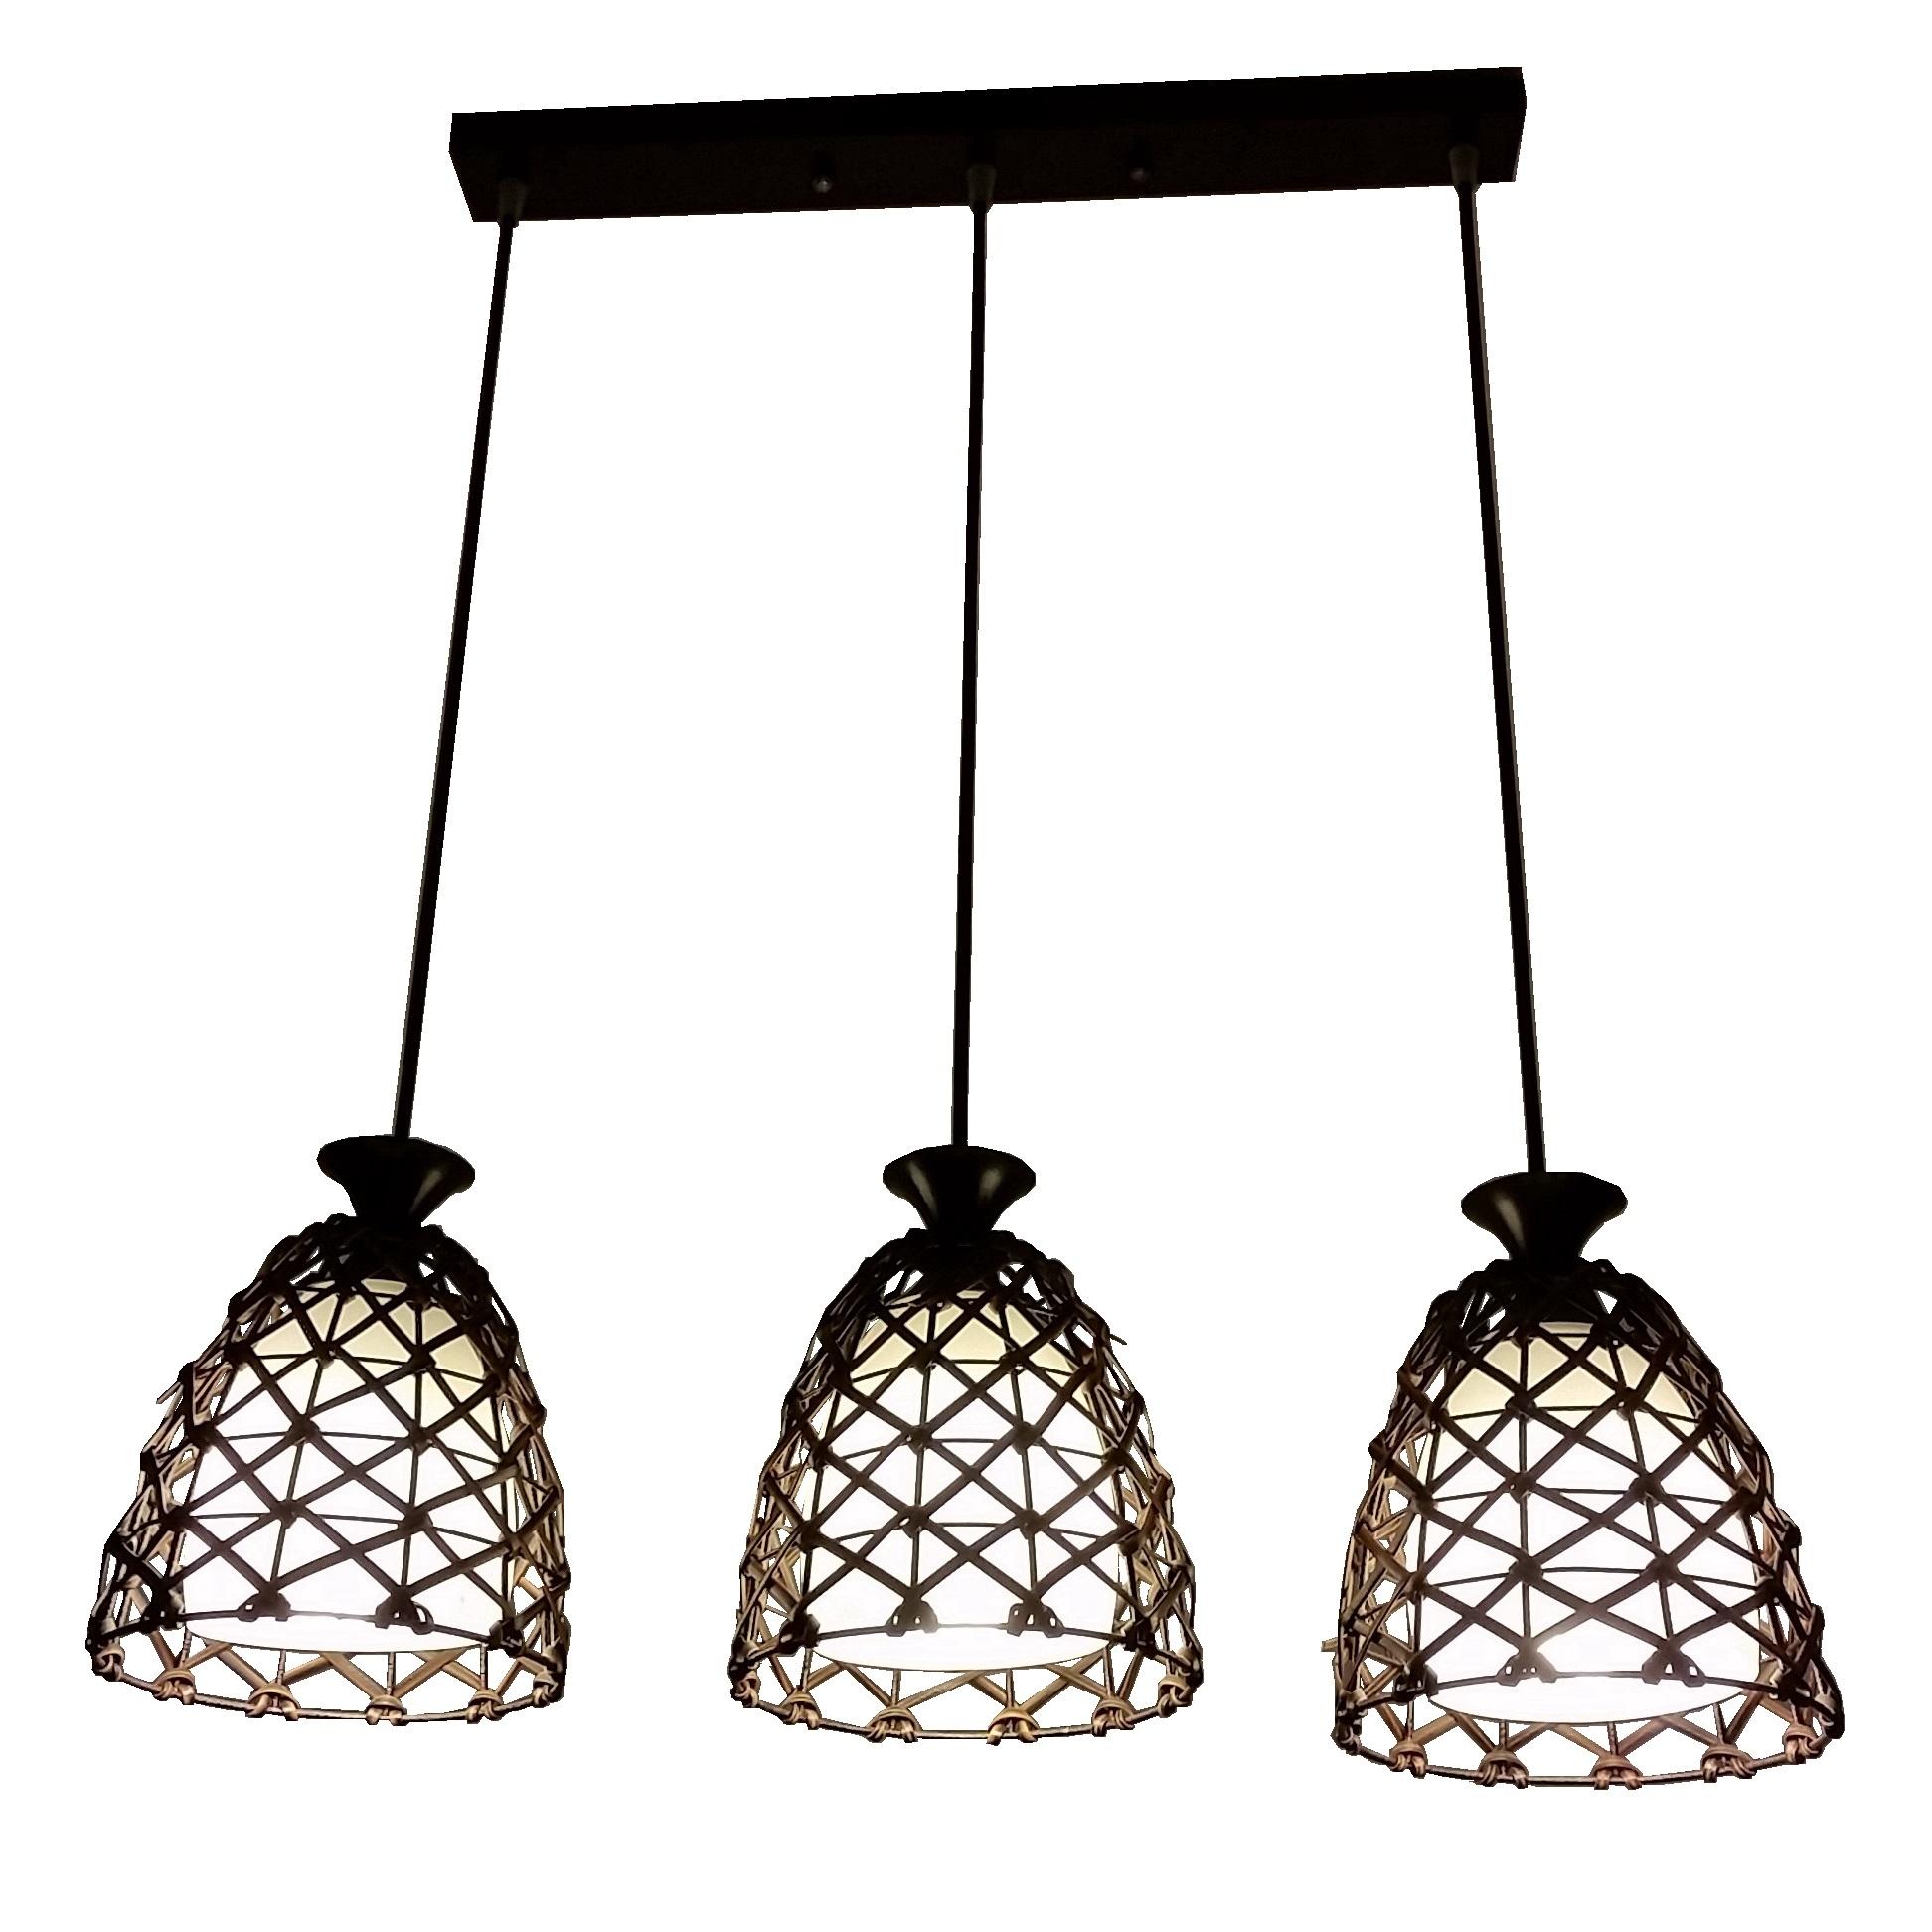 PL1919 3 Hanging Pendant Lamp L Brilliant Source Lighting